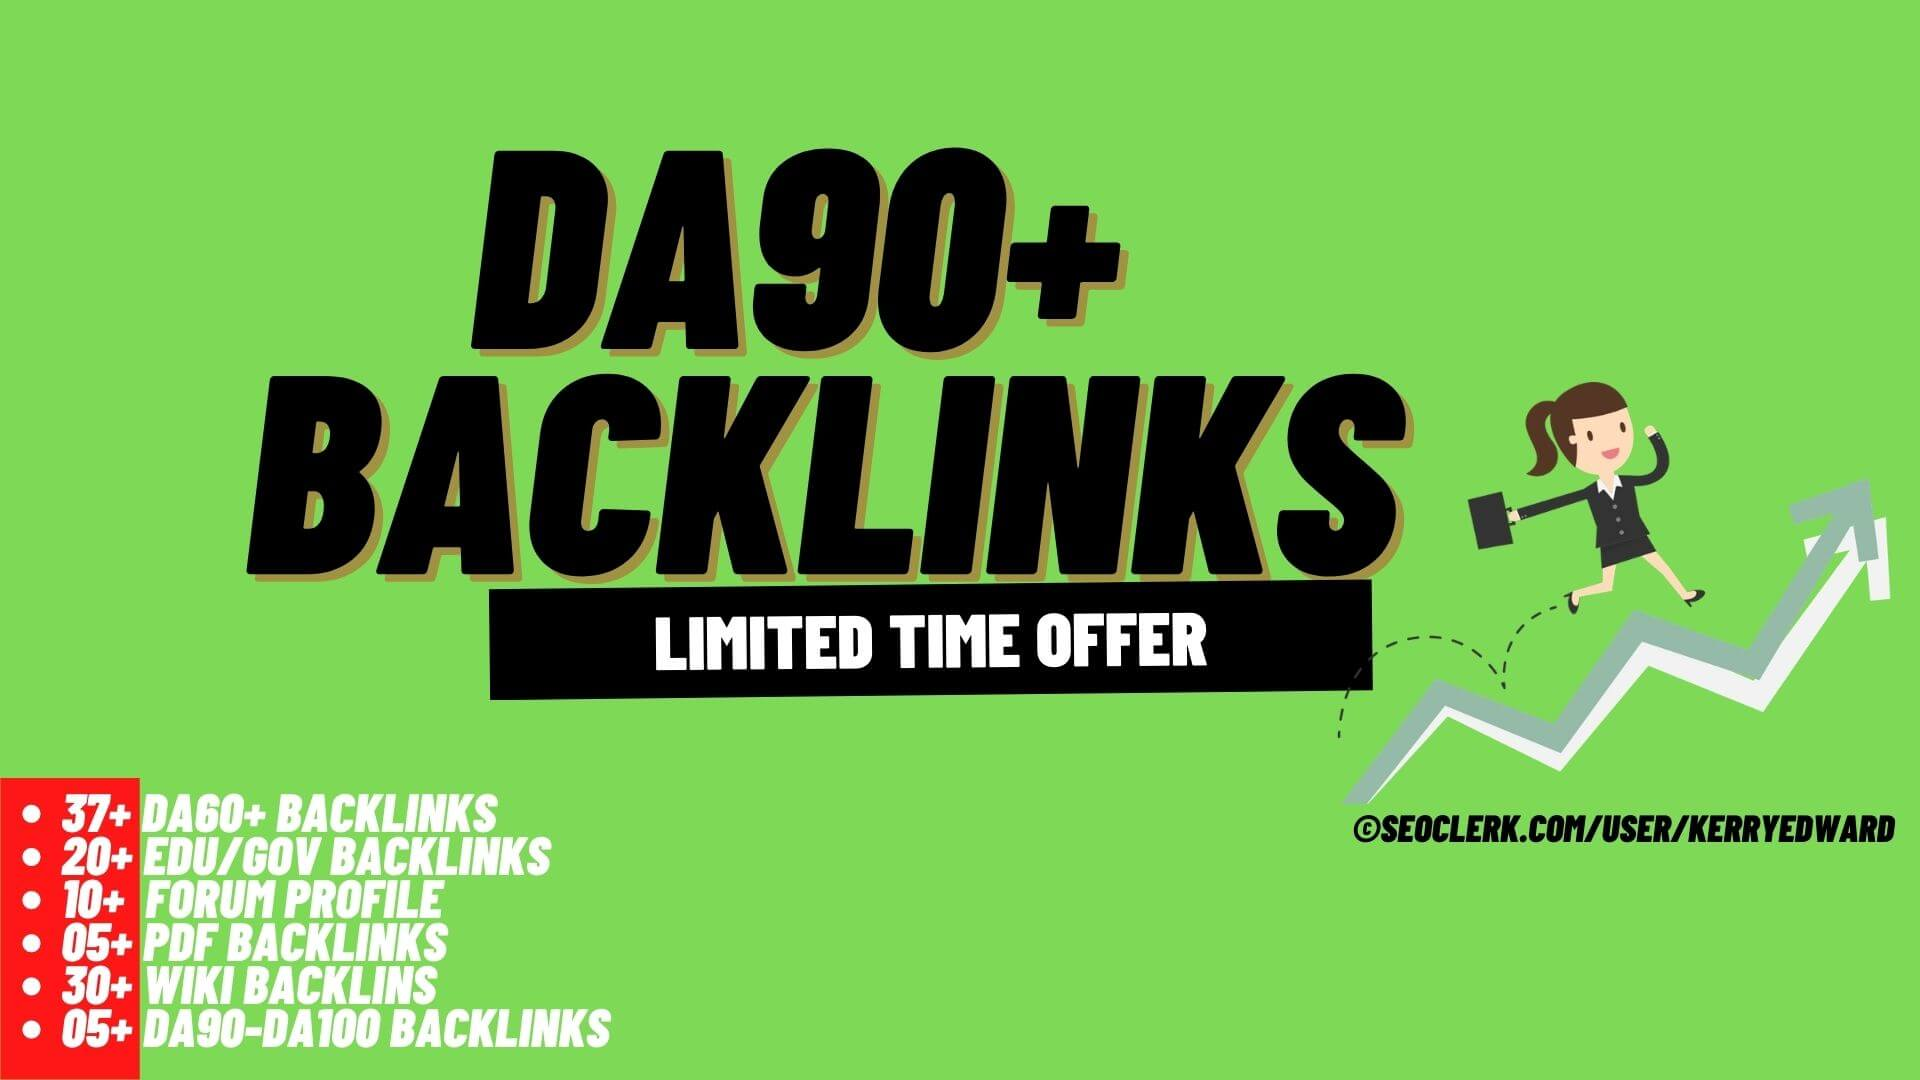 DA90+ Backlinks - 20 Edu/Gov,  30 Wiki,  10 Forum,  05 PDF,  37 DA60+,  and 05 from DA90+